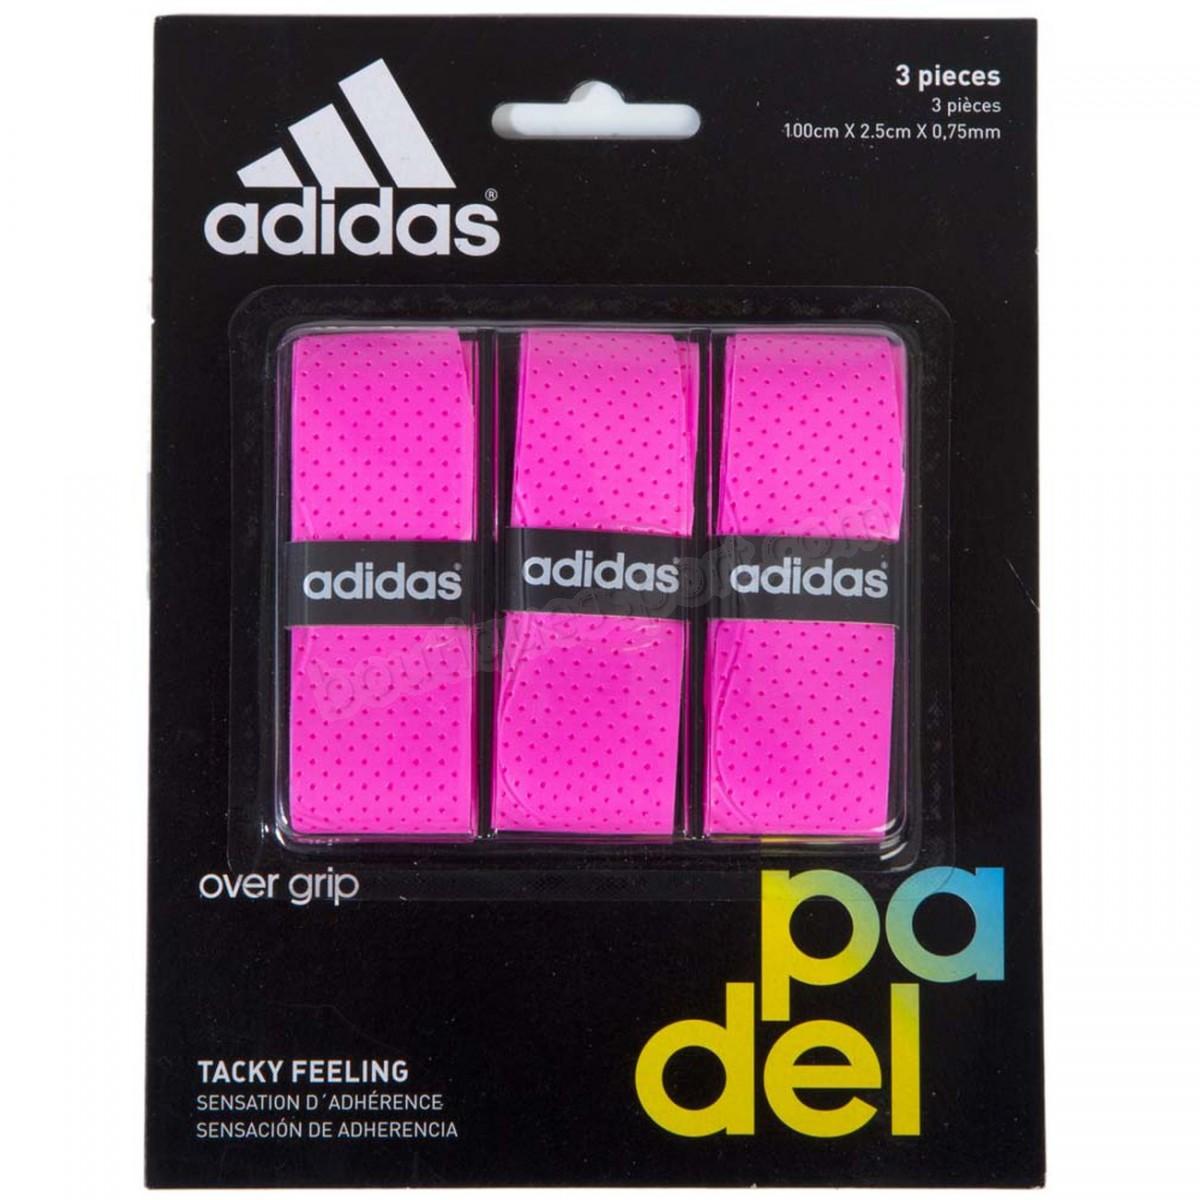 Tennis adulte ADIDAS PADEL Adidas Padel Set Of Overgrip Soldes - -0